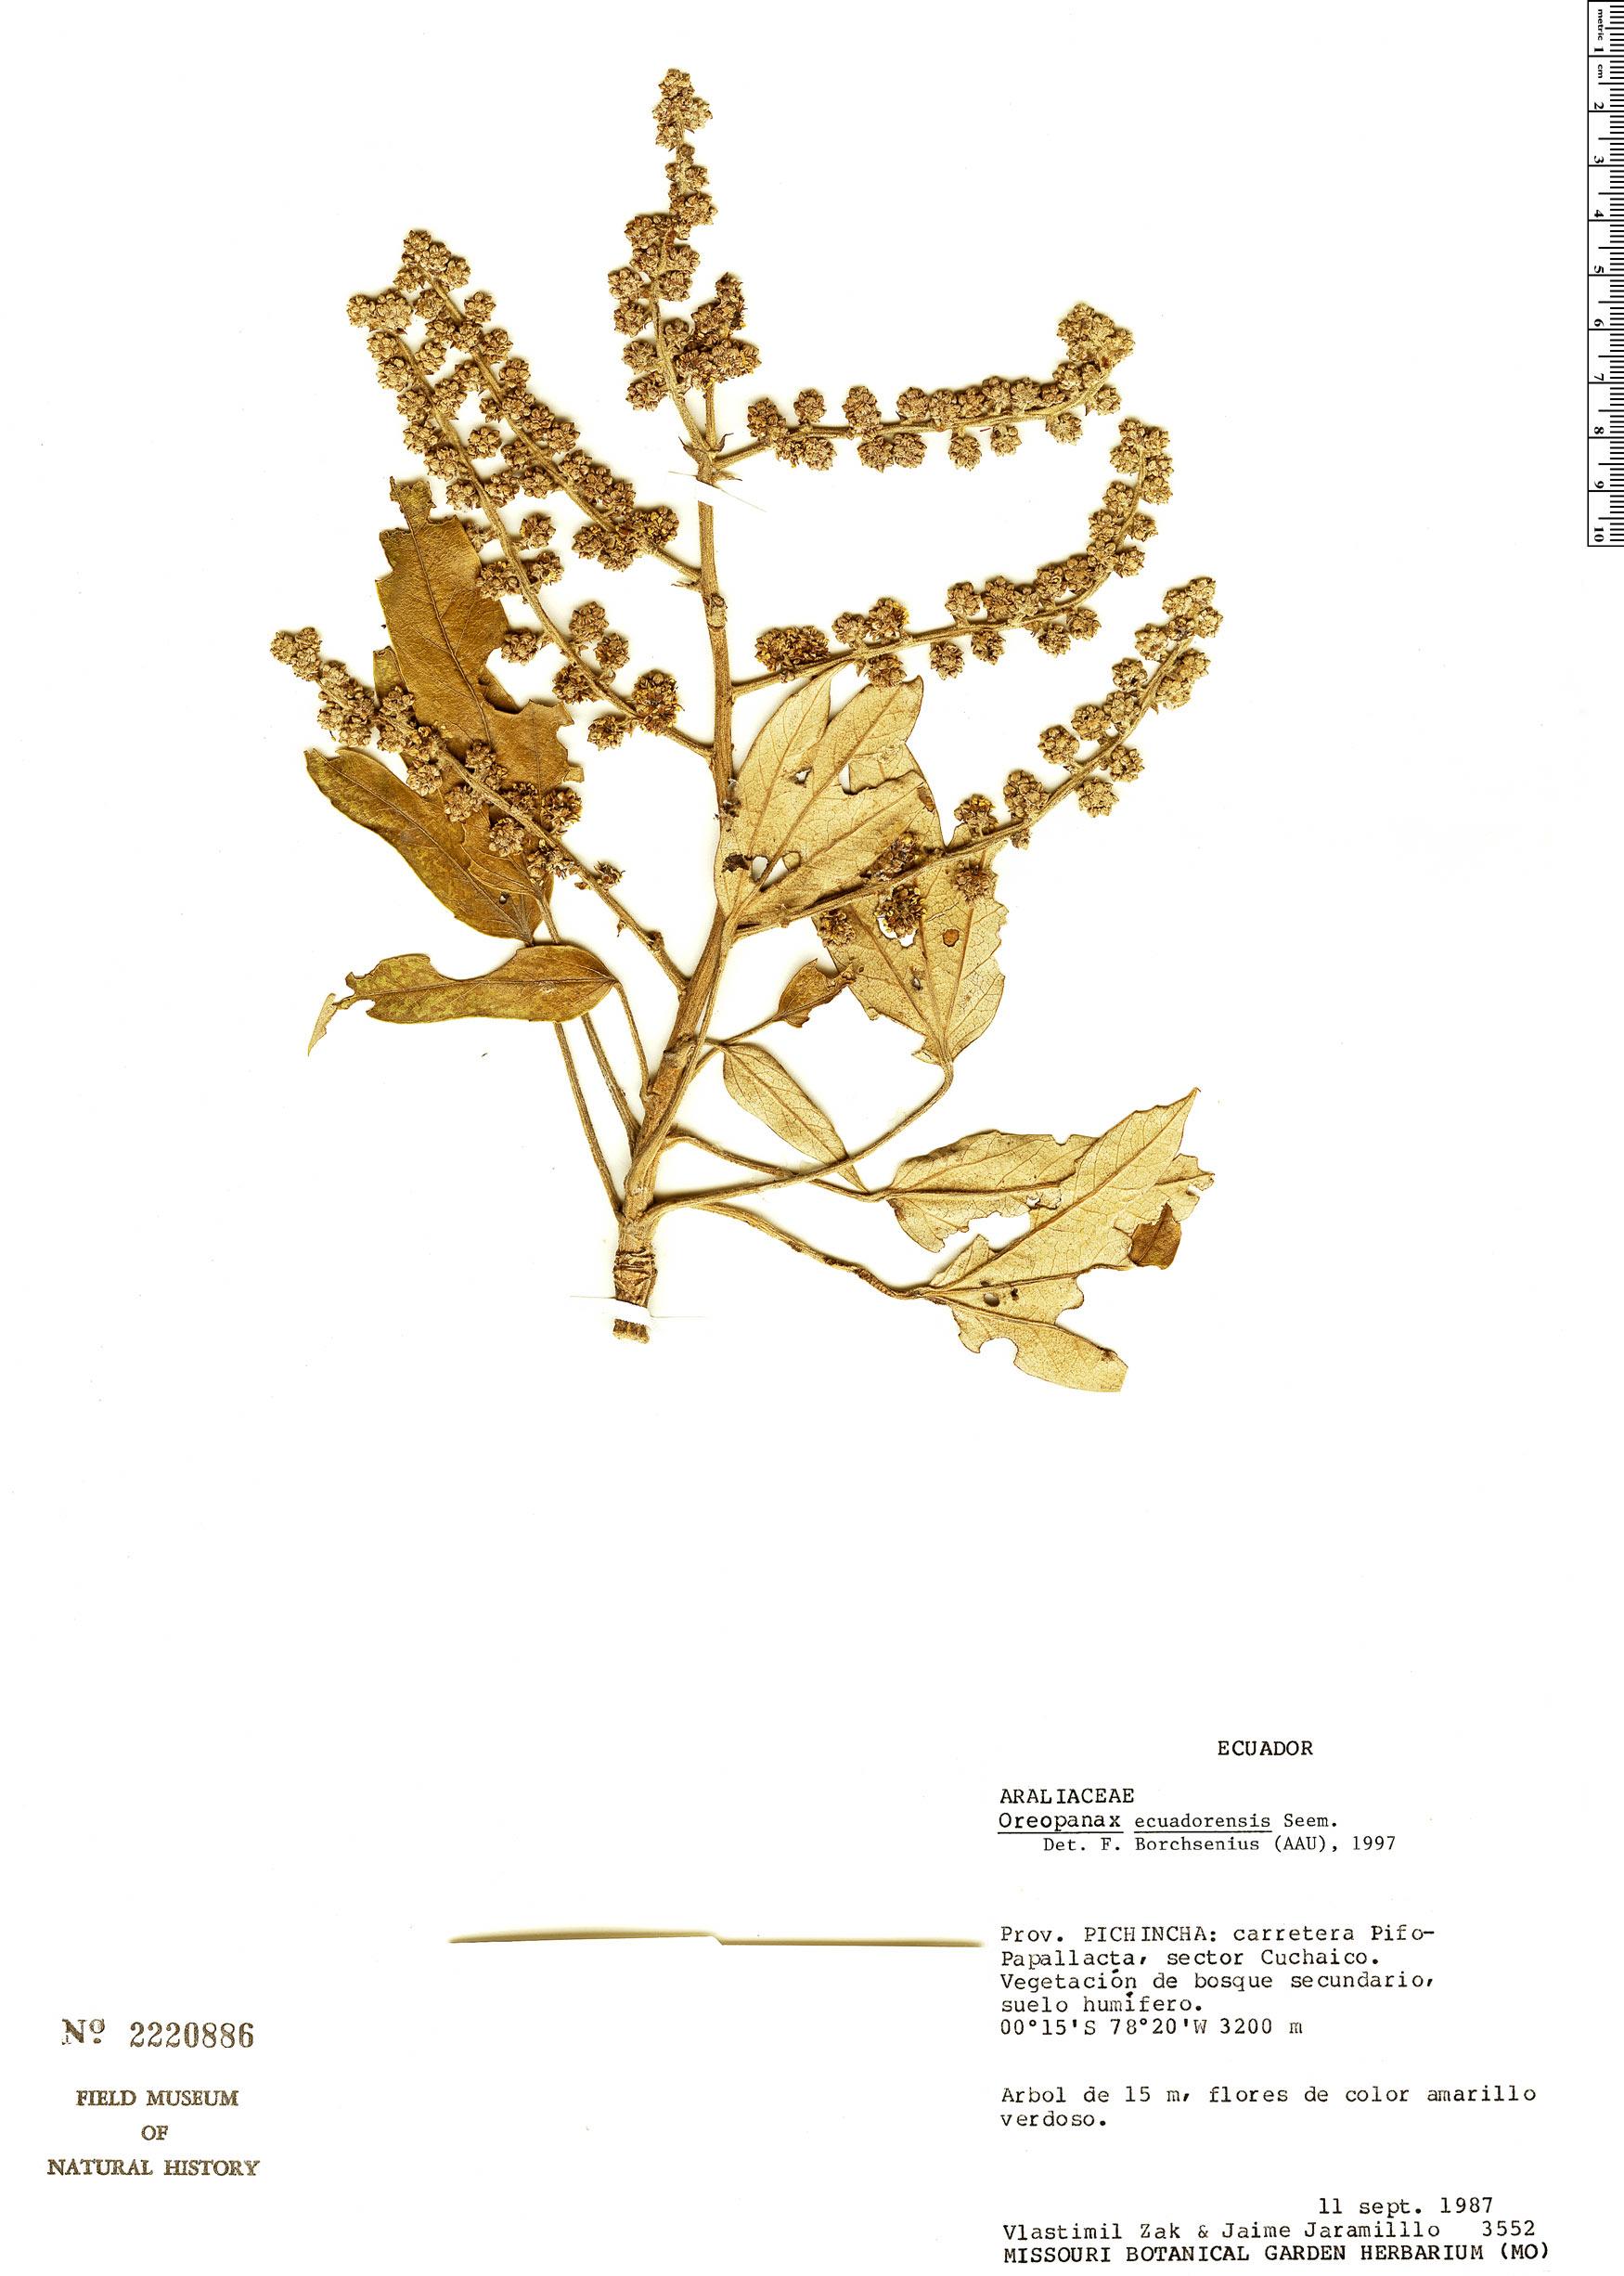 Specimen: Oreopanax ecuadorensis